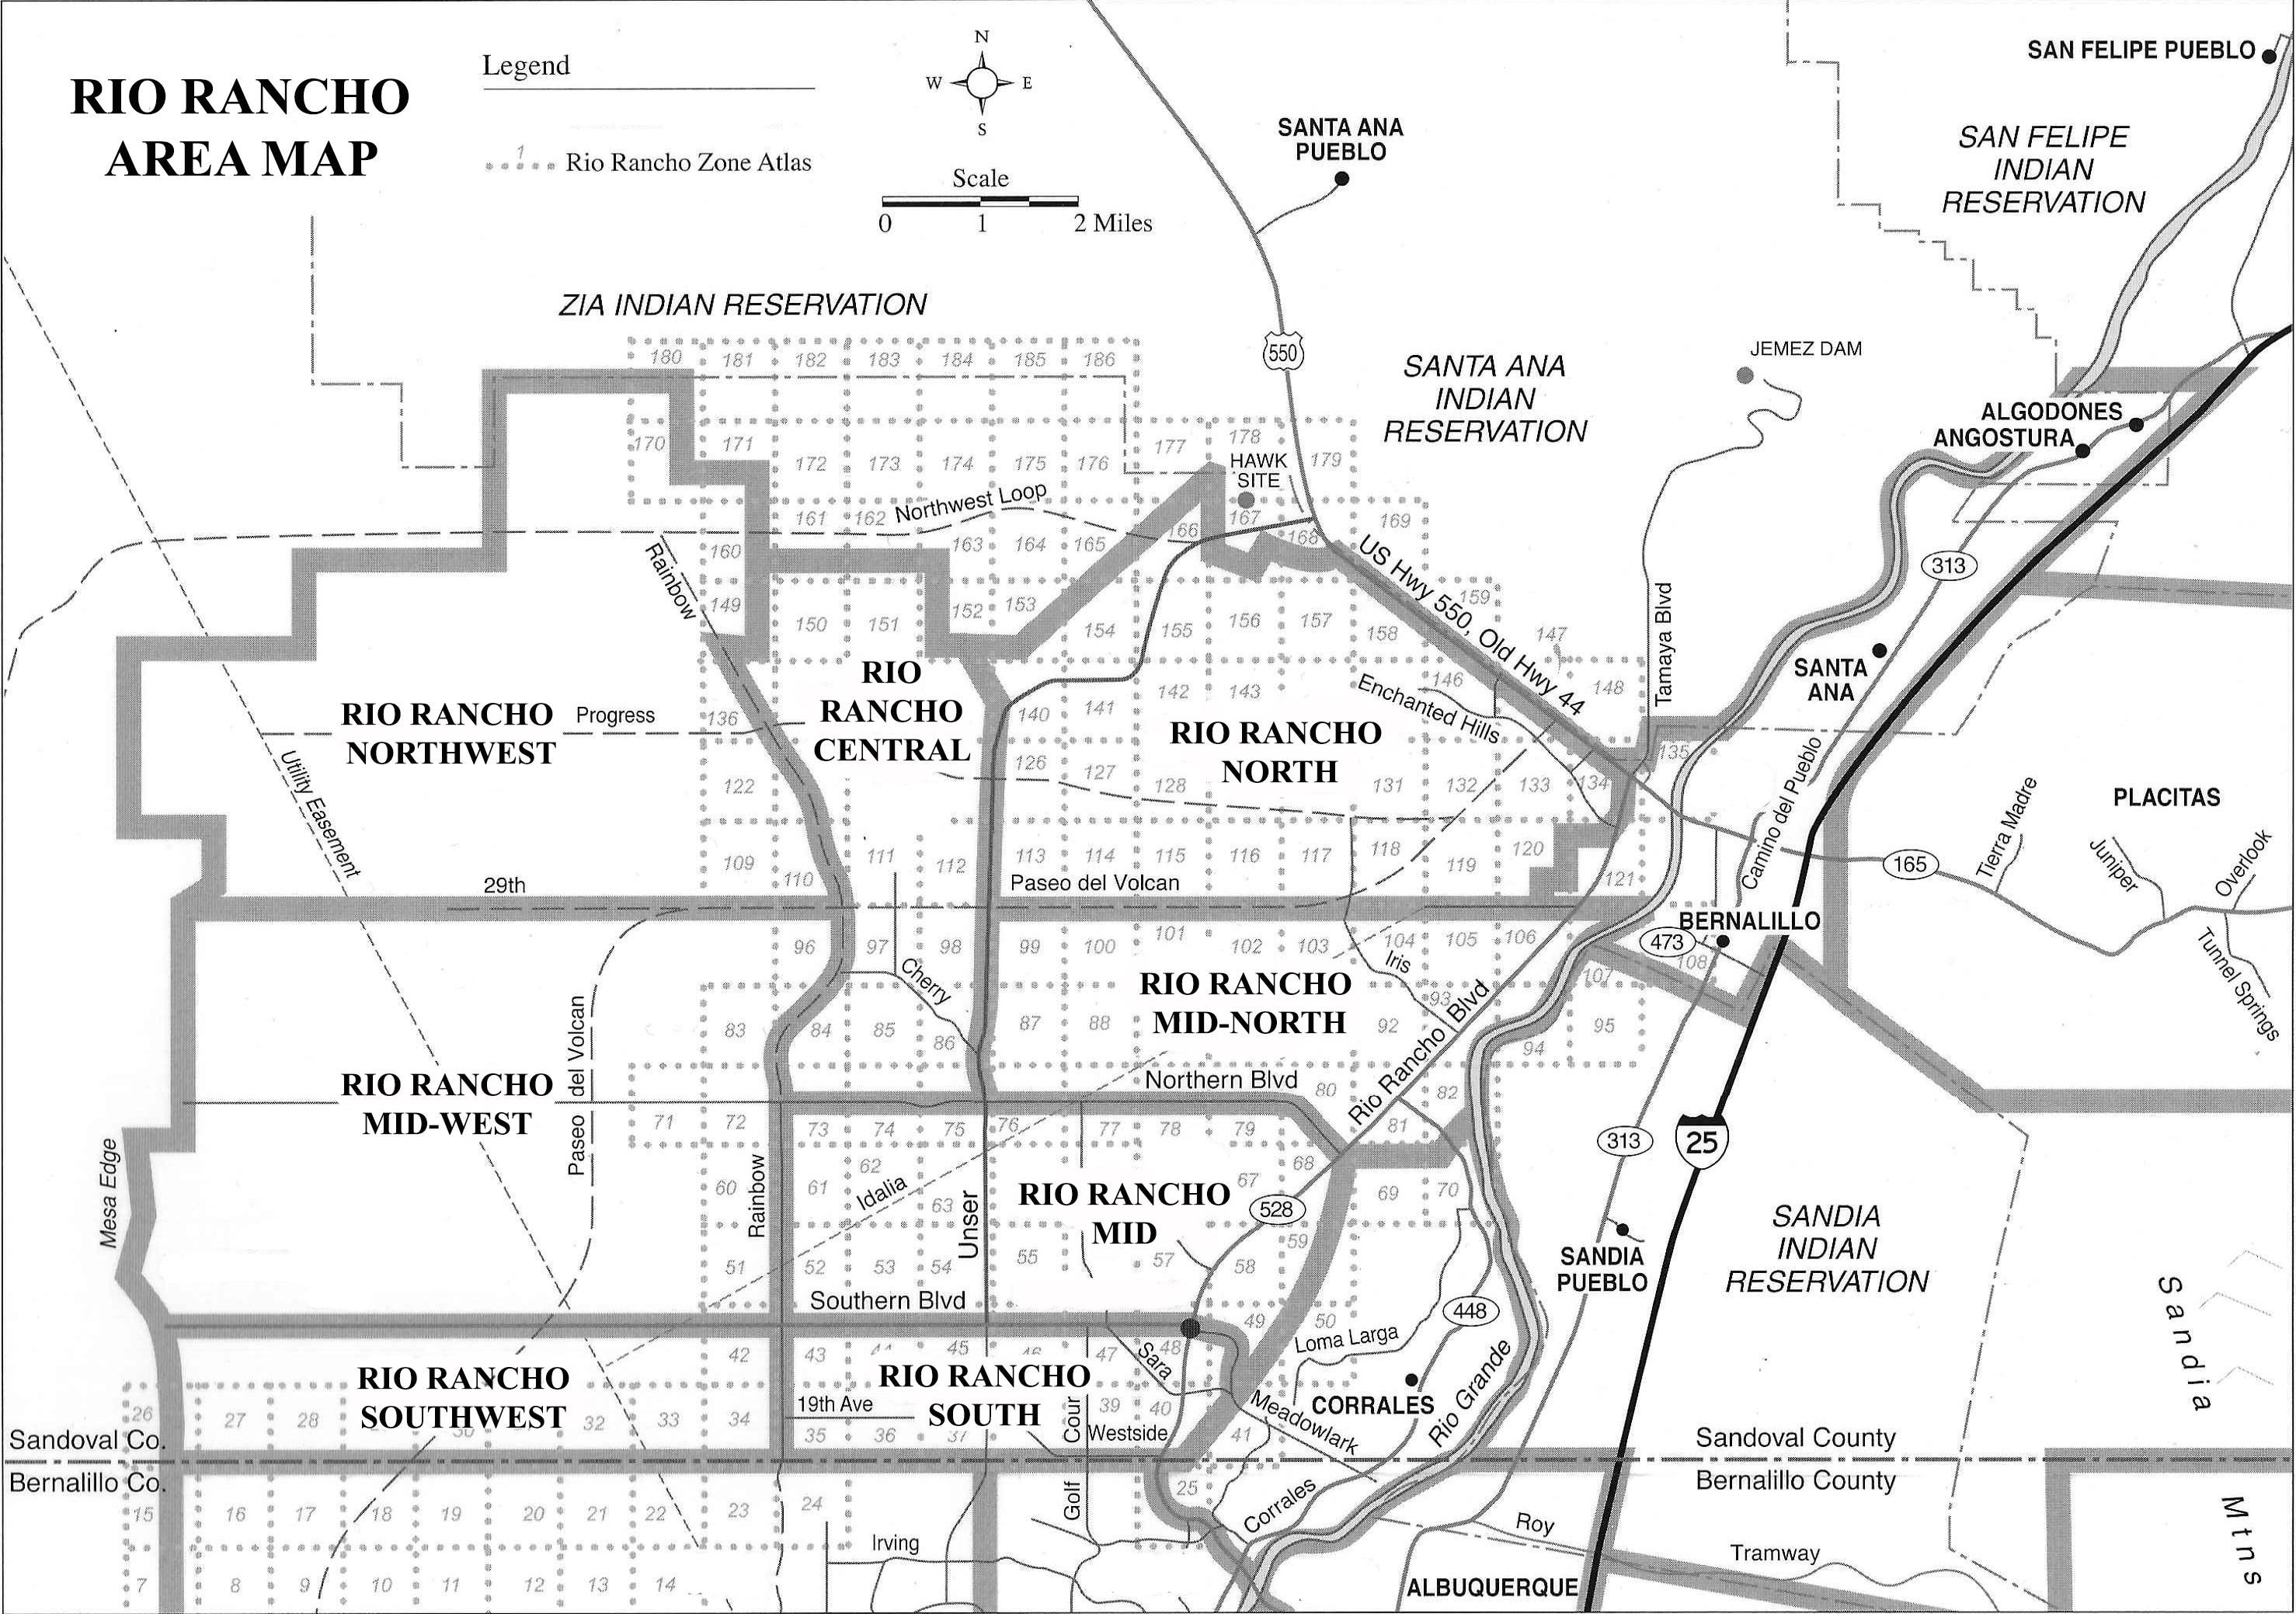 Rio Rancho Map Areas